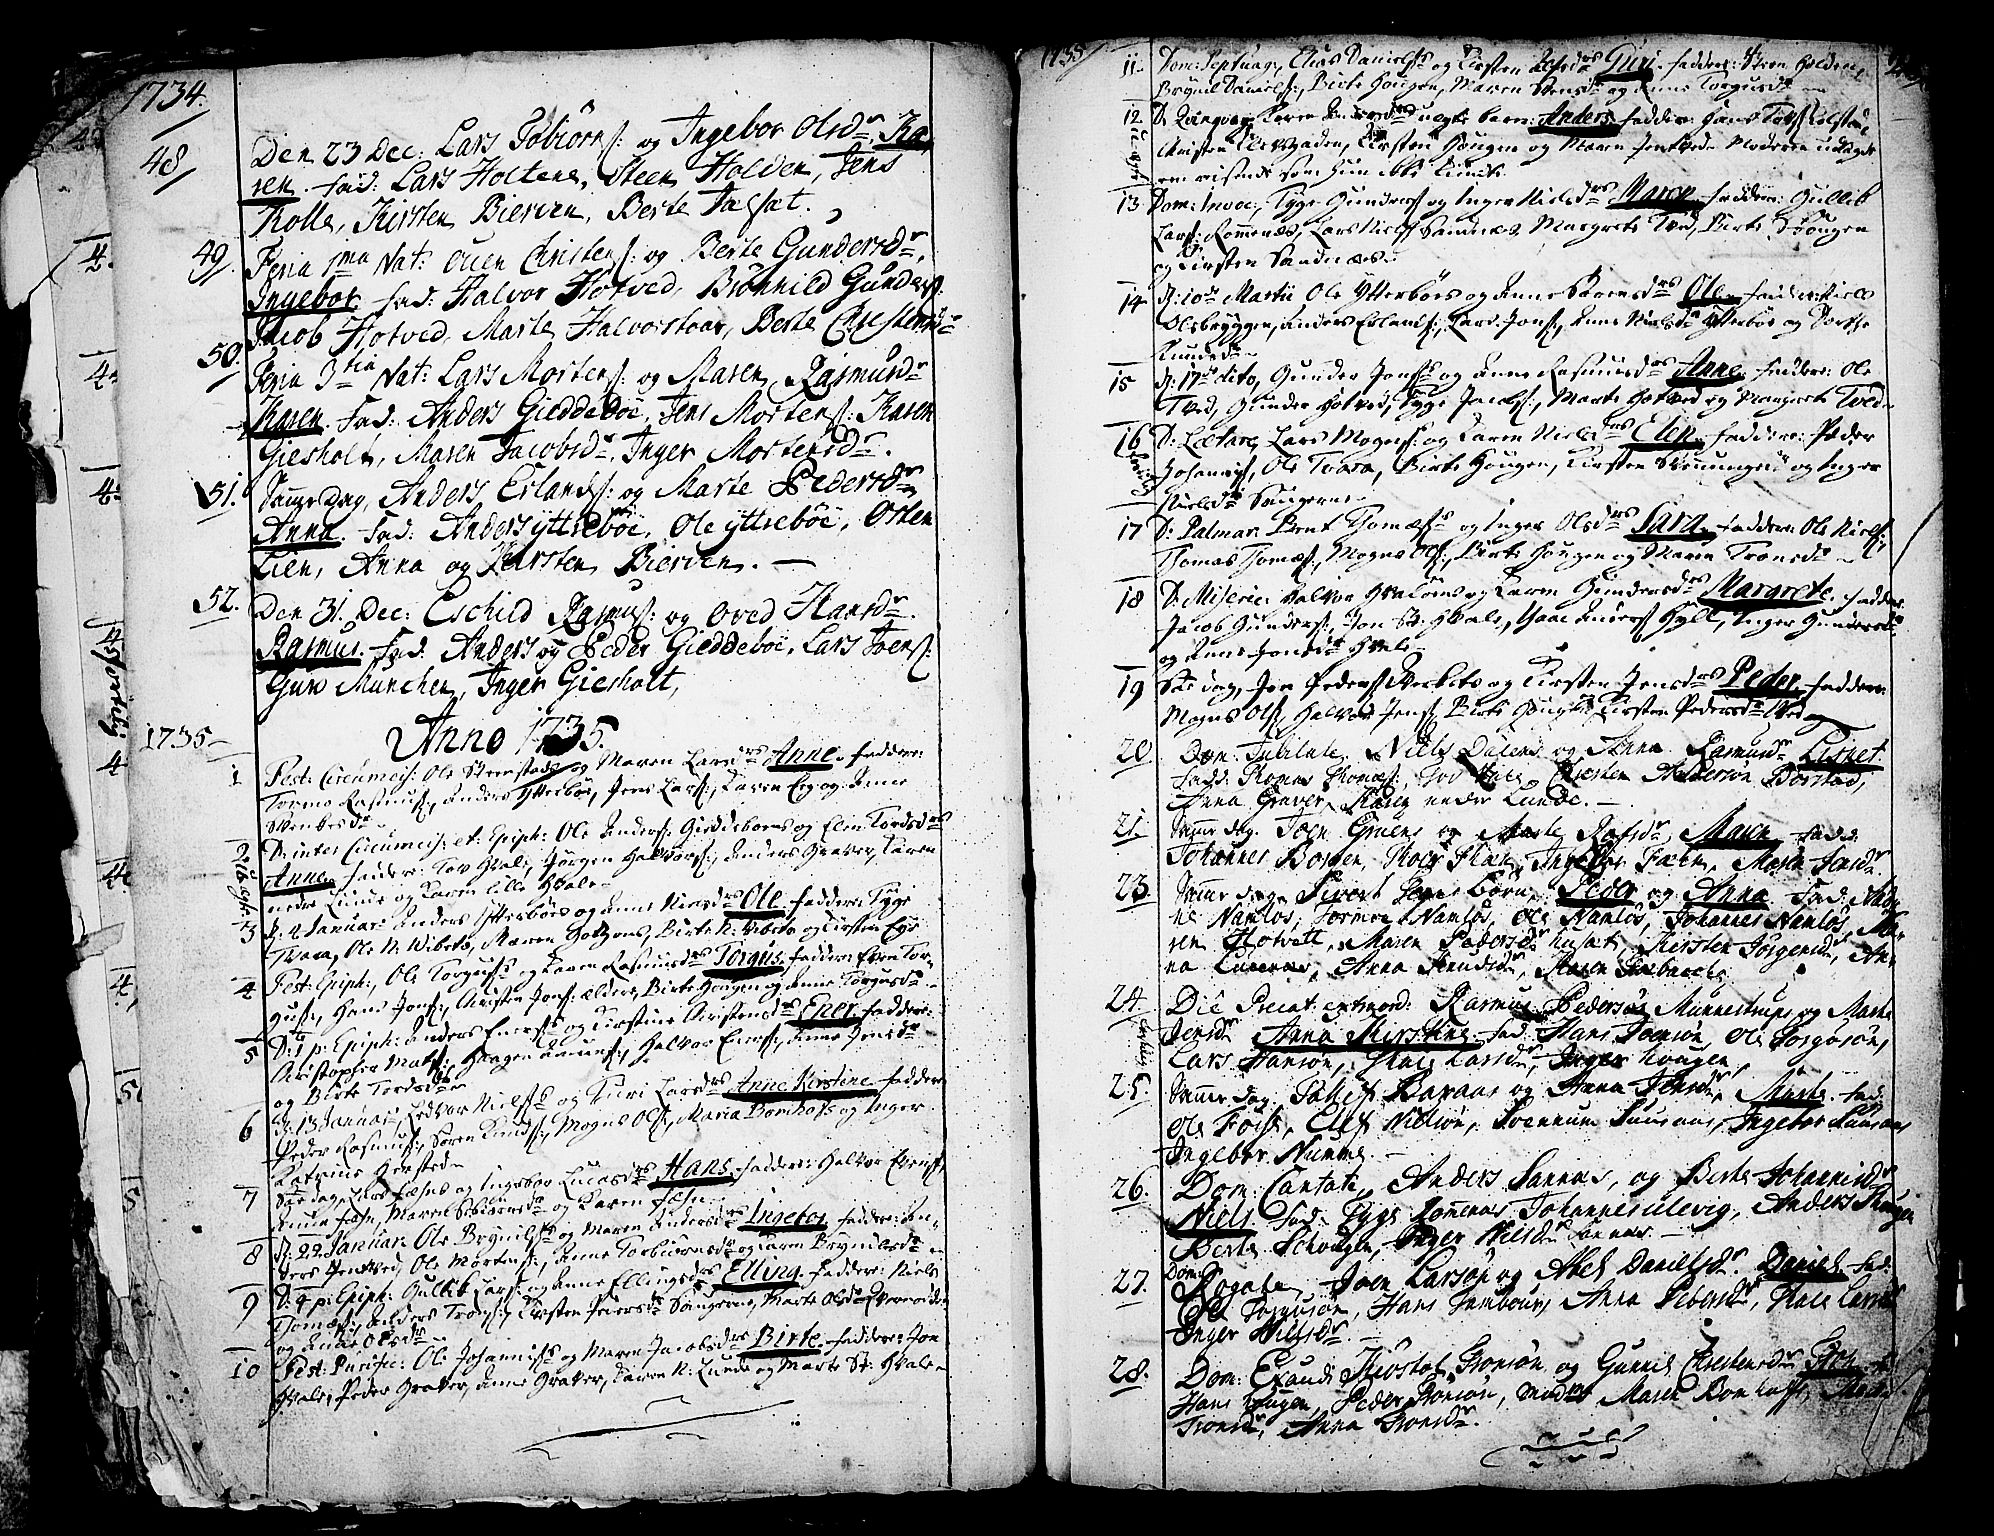 SAKO, Holla kirkebøker, F/Fa/L0001: Ministerialbok nr. 1, 1717-1779, s. 26